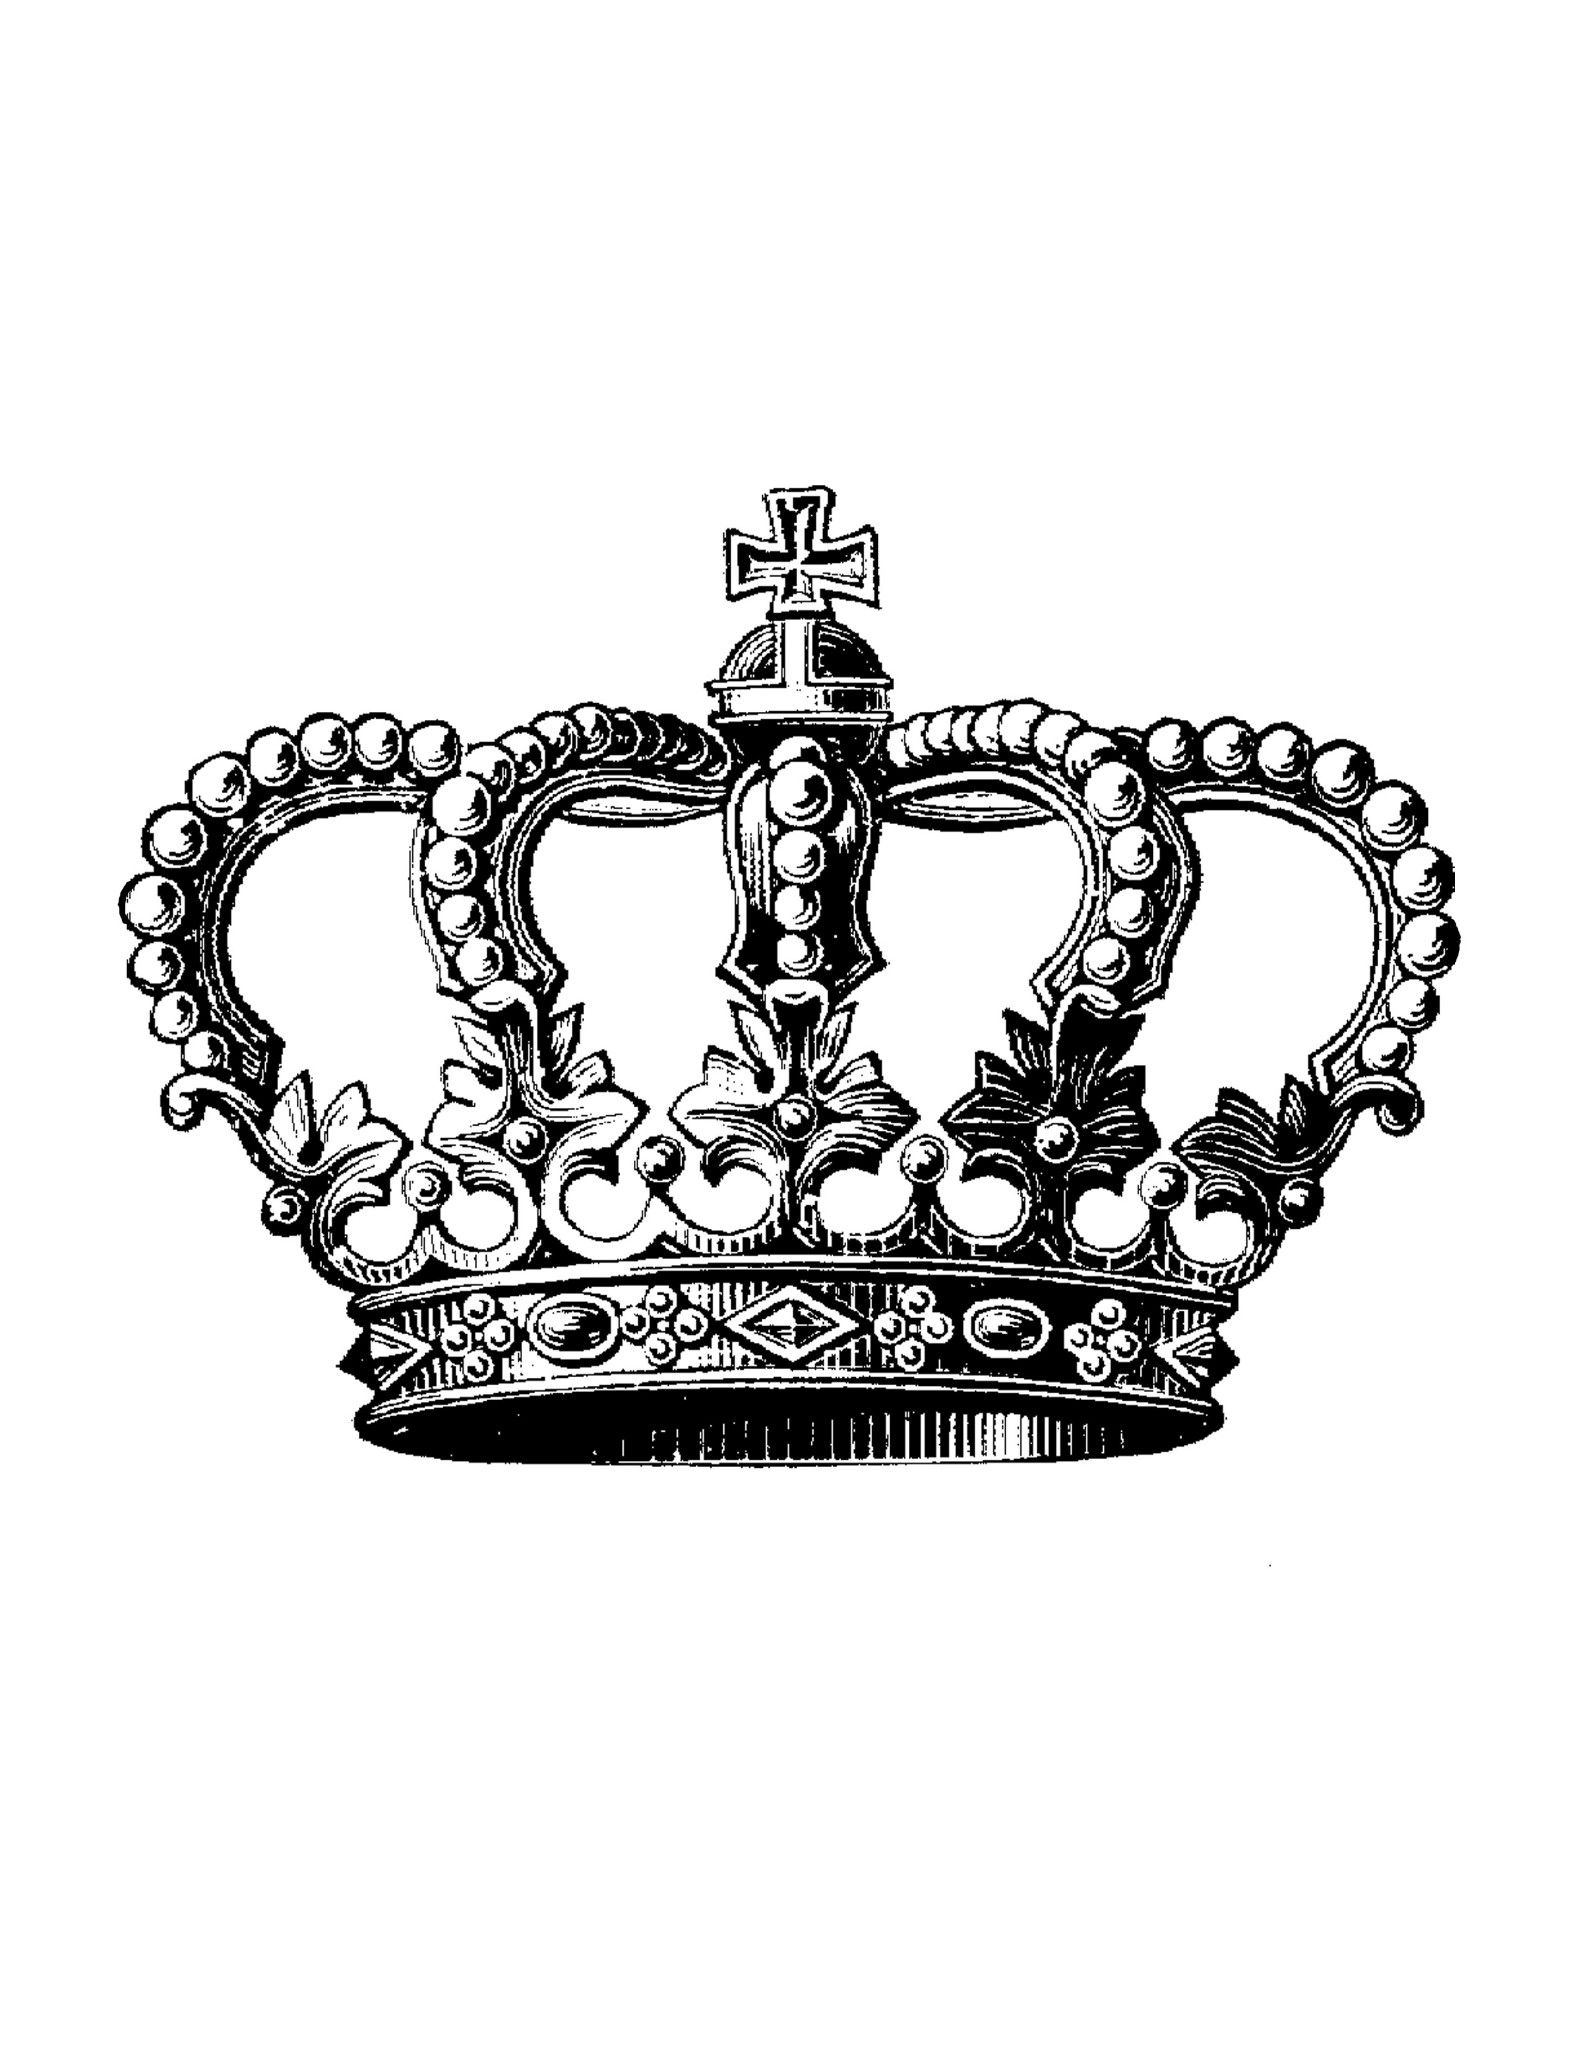 Pin by Людмила on ВИНТАЖ. КОЛЛАЖ.НОТЫ | Pinterest | Royal logo ...